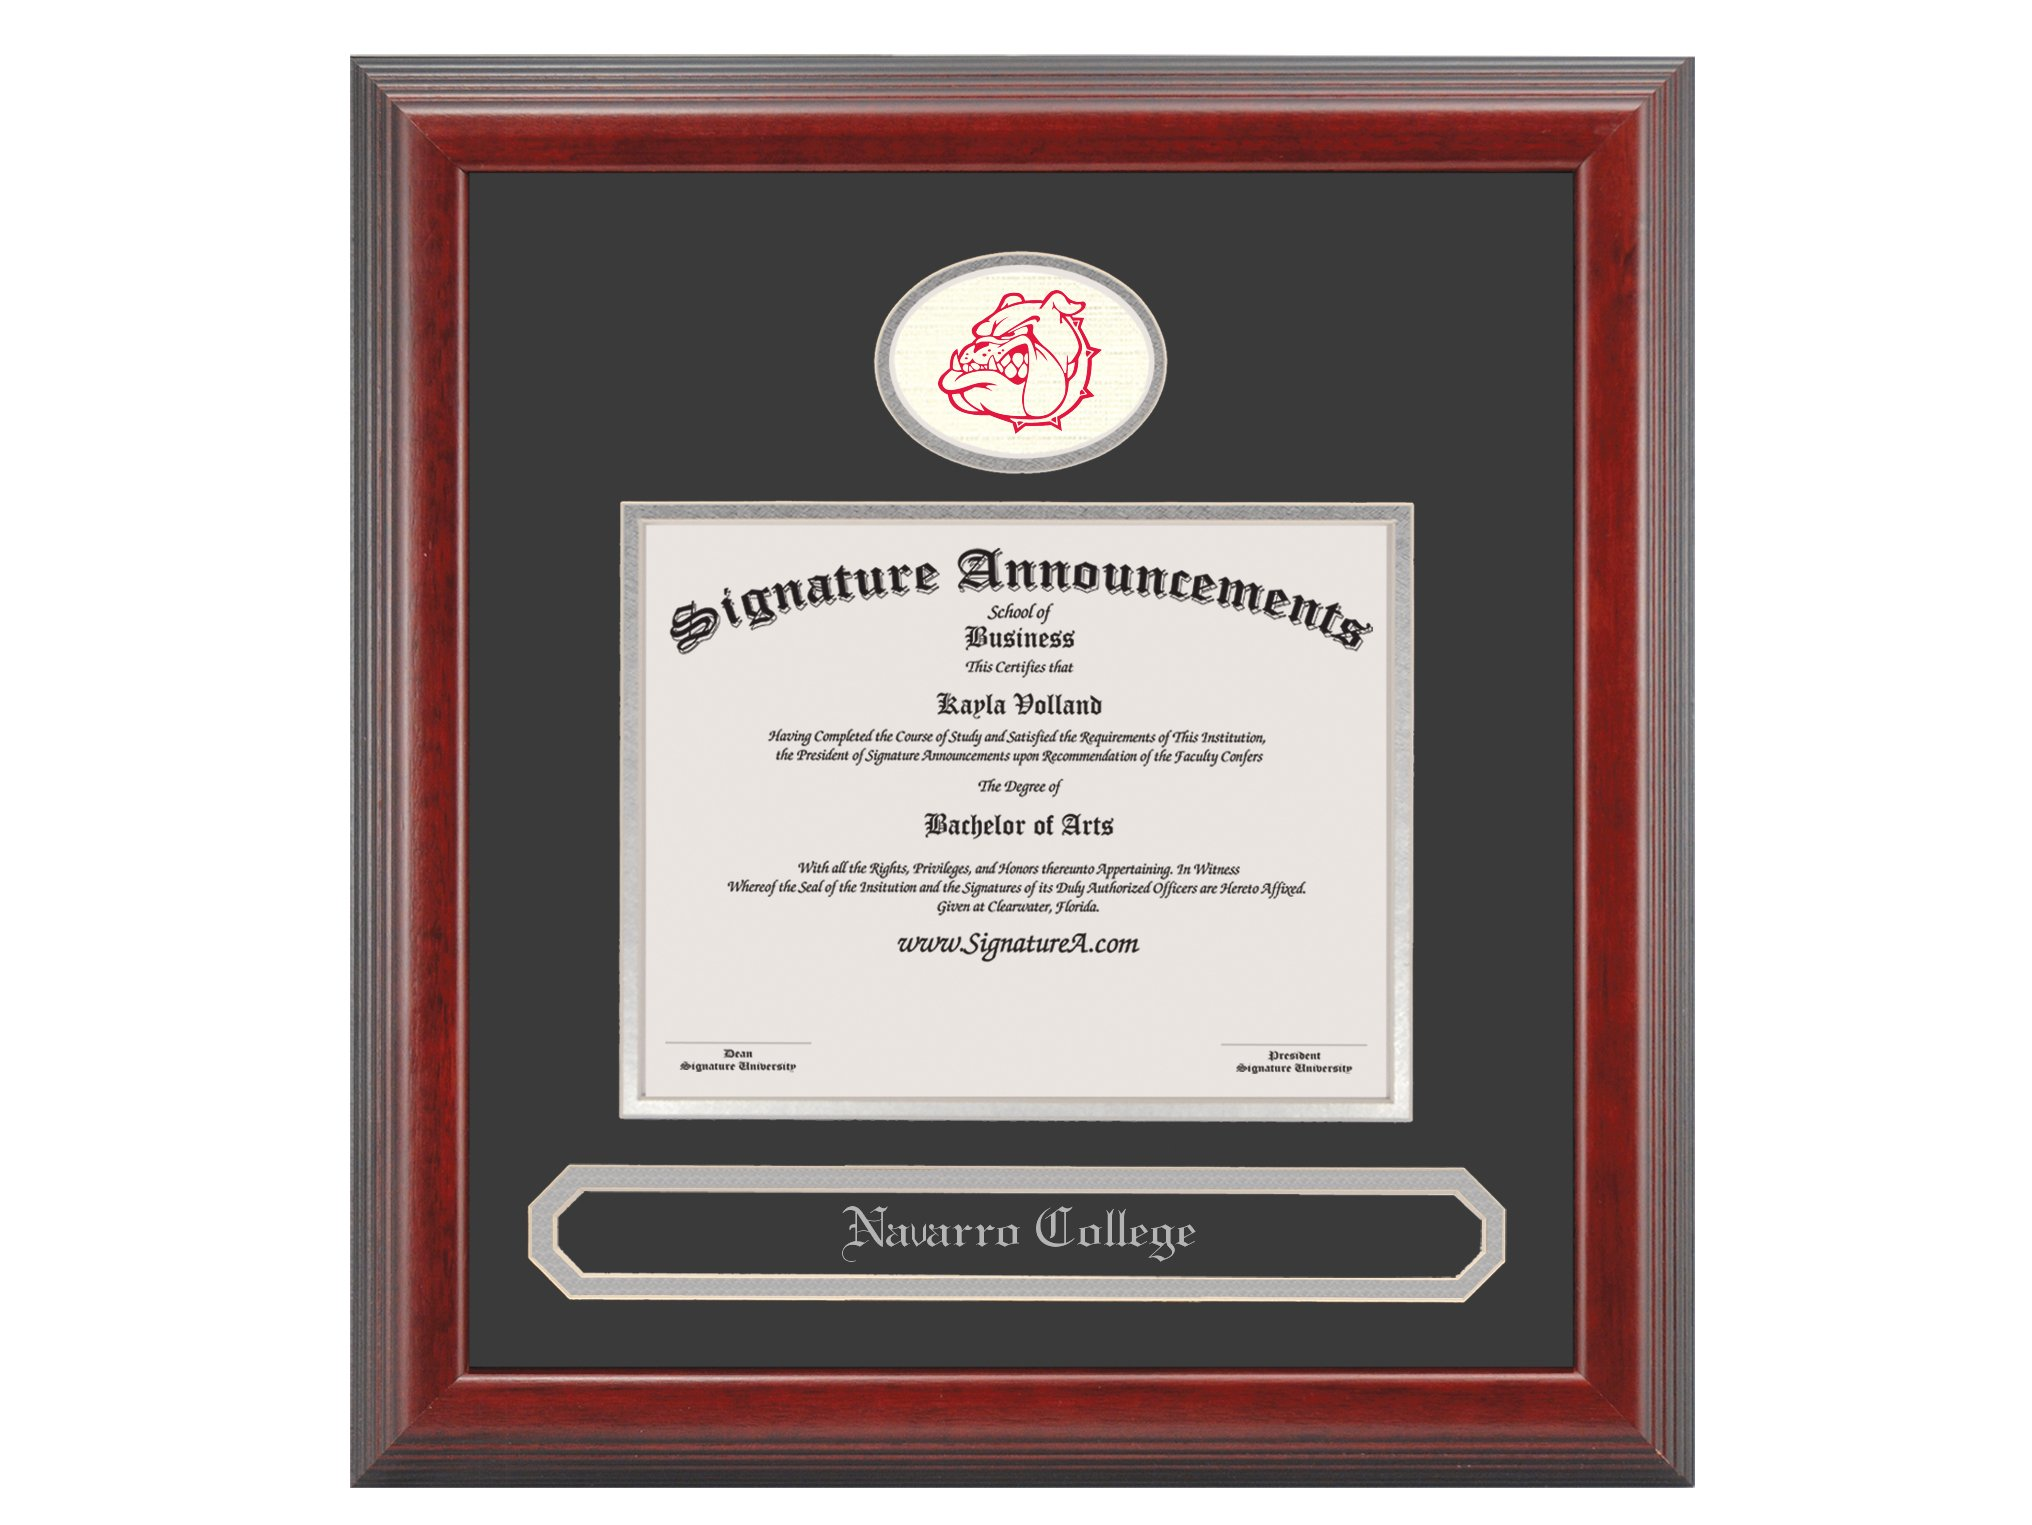 Signature Announcements Navarro-College Undergraduate, Graduate/Professional/Doctor Sculpted Foil Seal & Name Diploma Frame, 16'' x 16'', Cherry